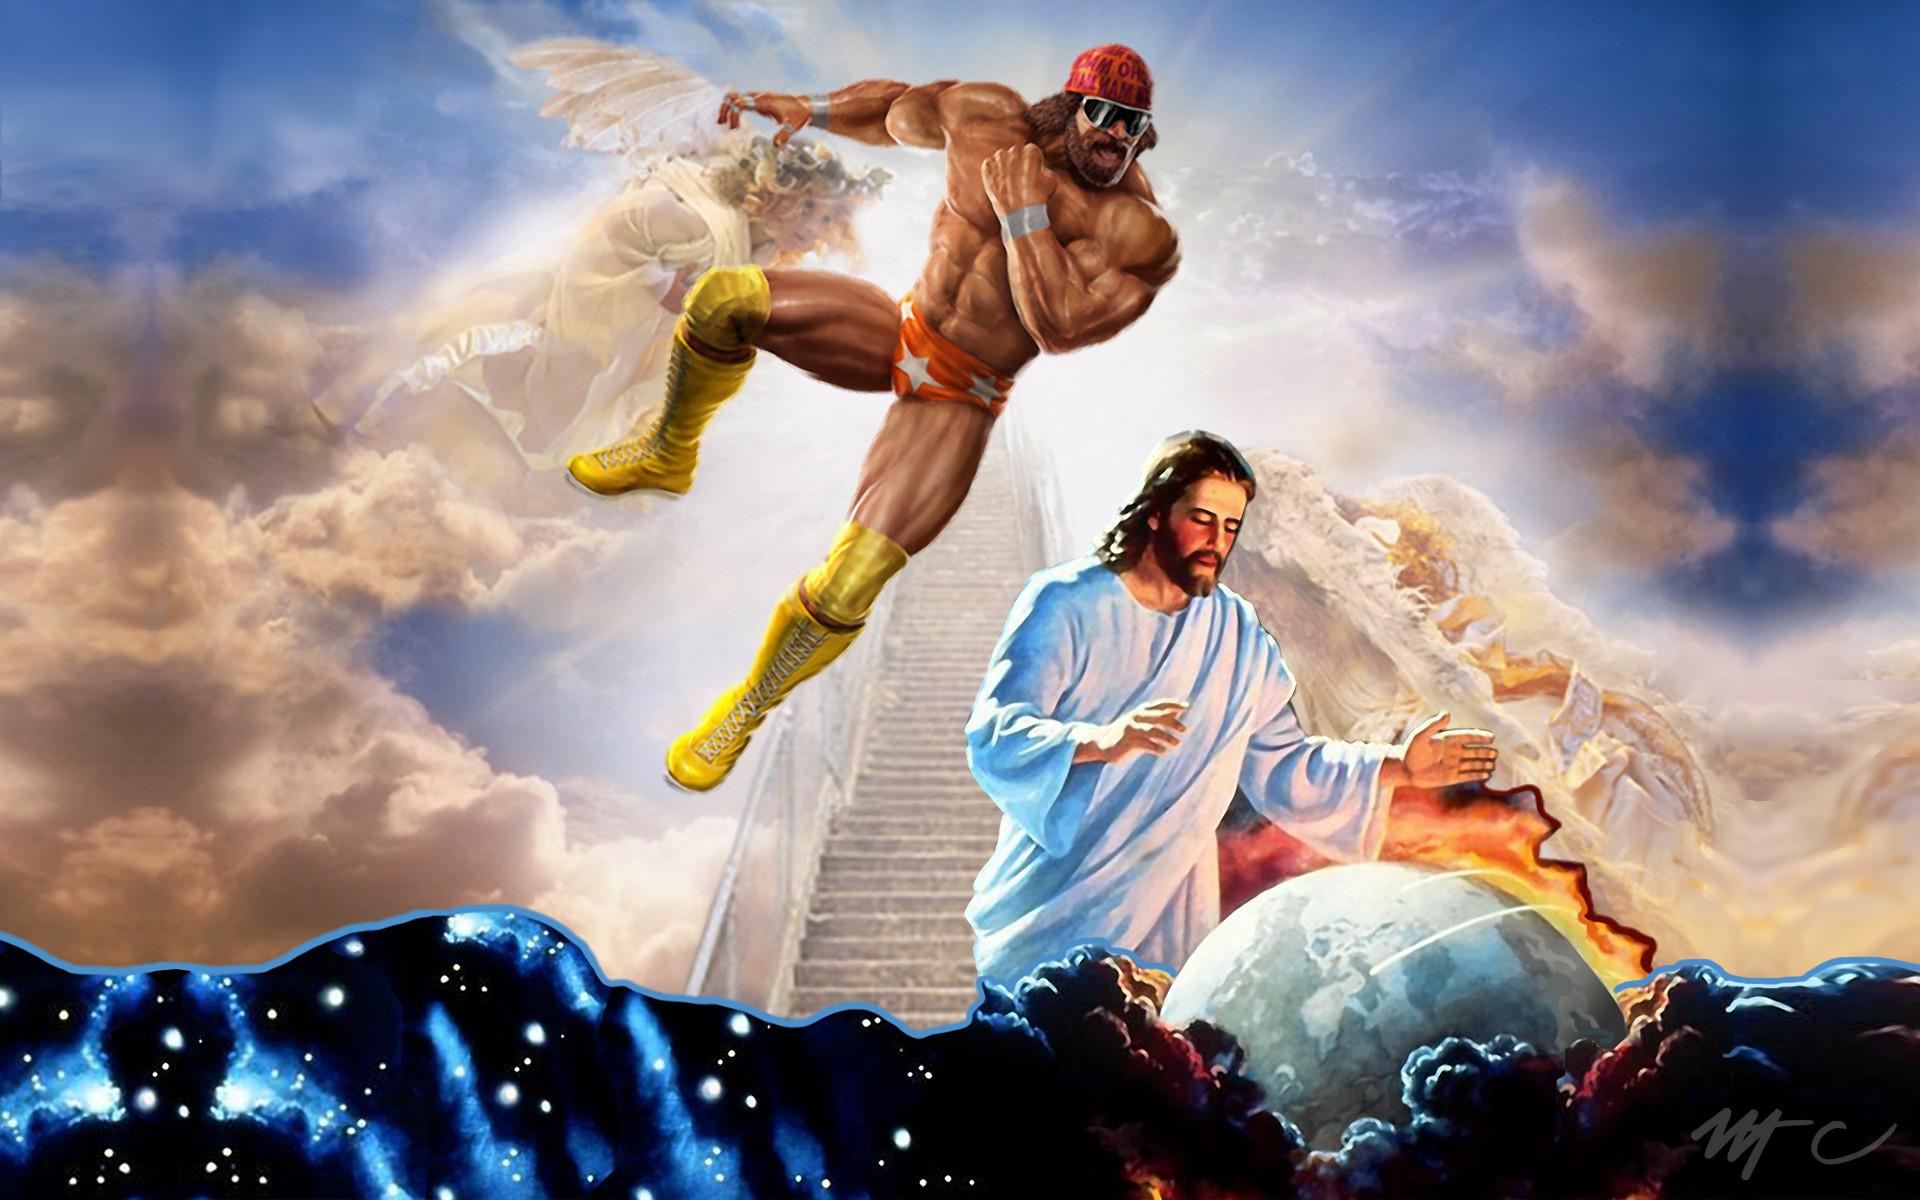 Macho Man Randy Savage Jesus wallpaper 253728